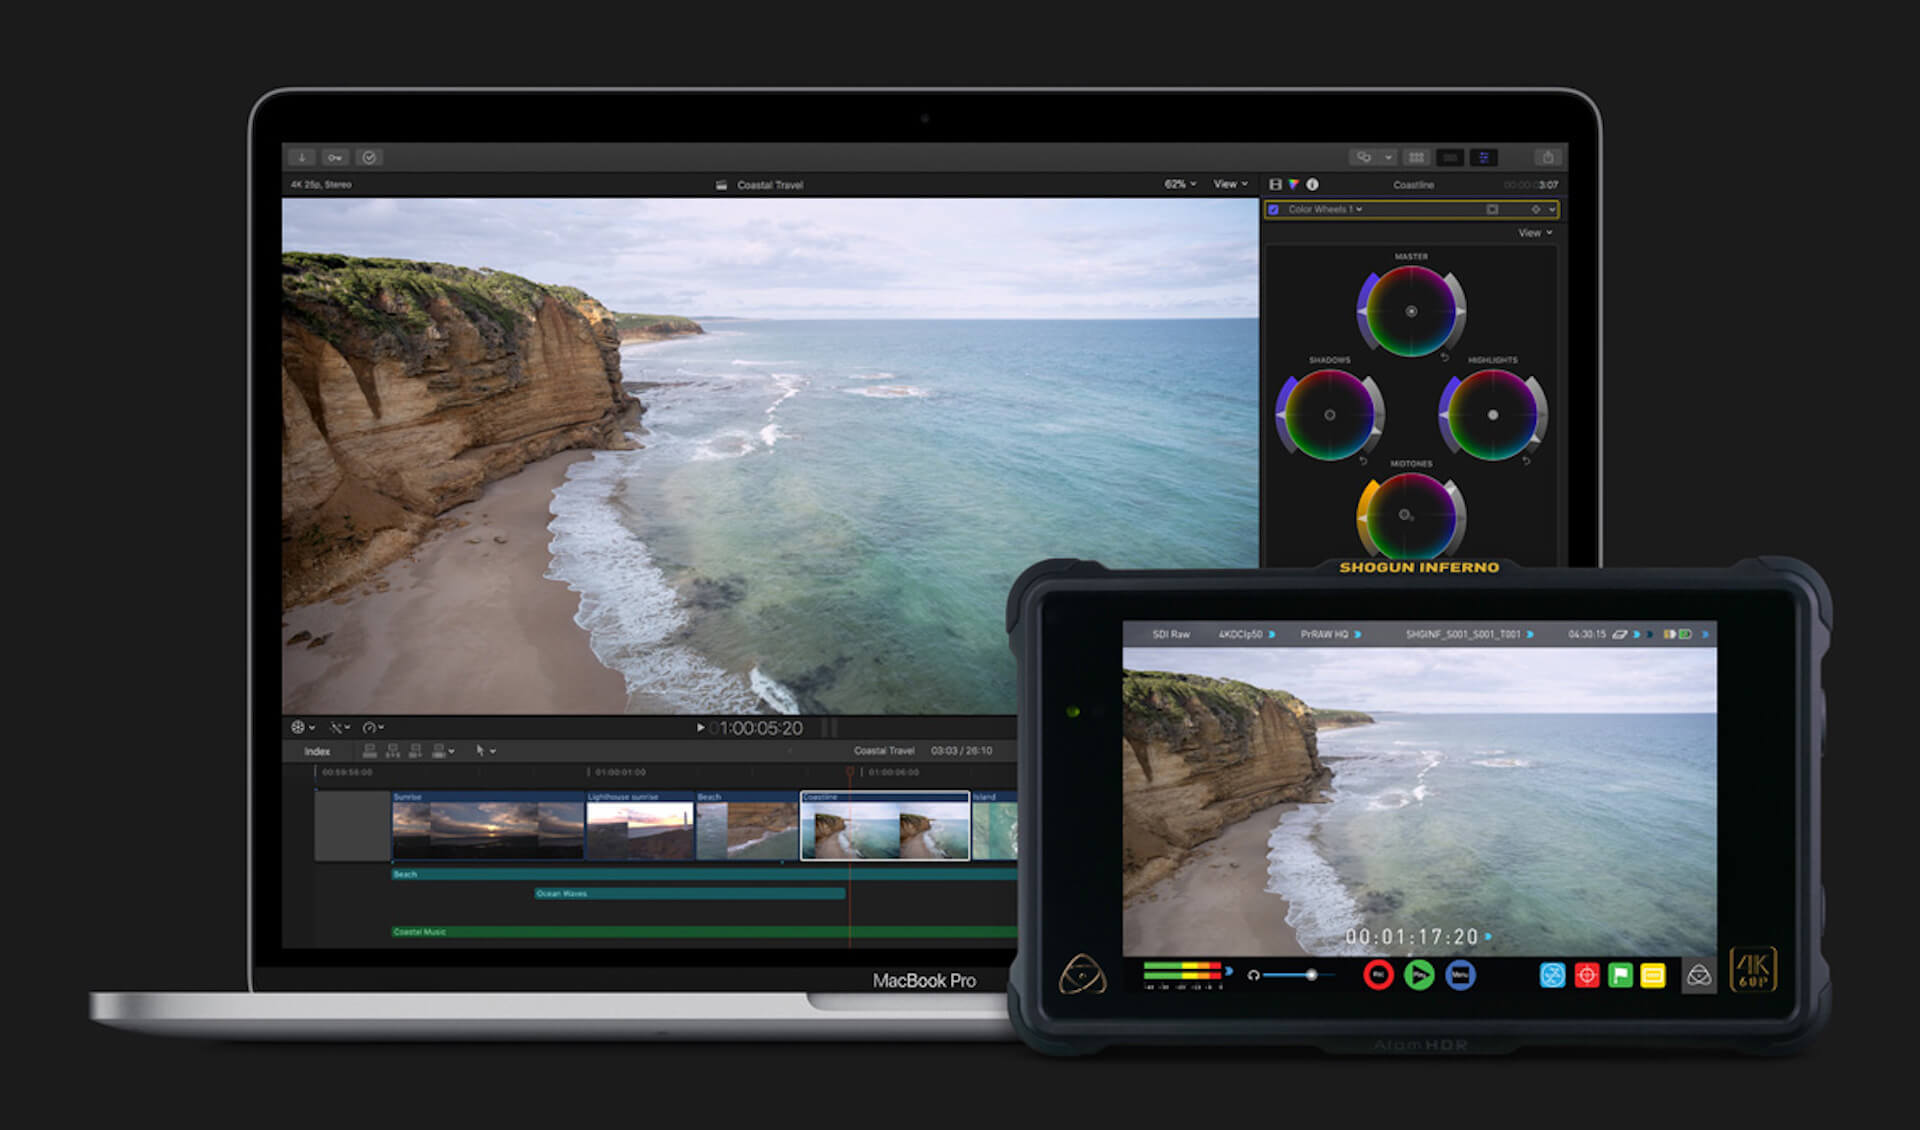 iPad Pro専用のFinal Cut Pro&Logic Proがついに登場する!?来年リリースの可能性 tech200423_ipad_fcp_1